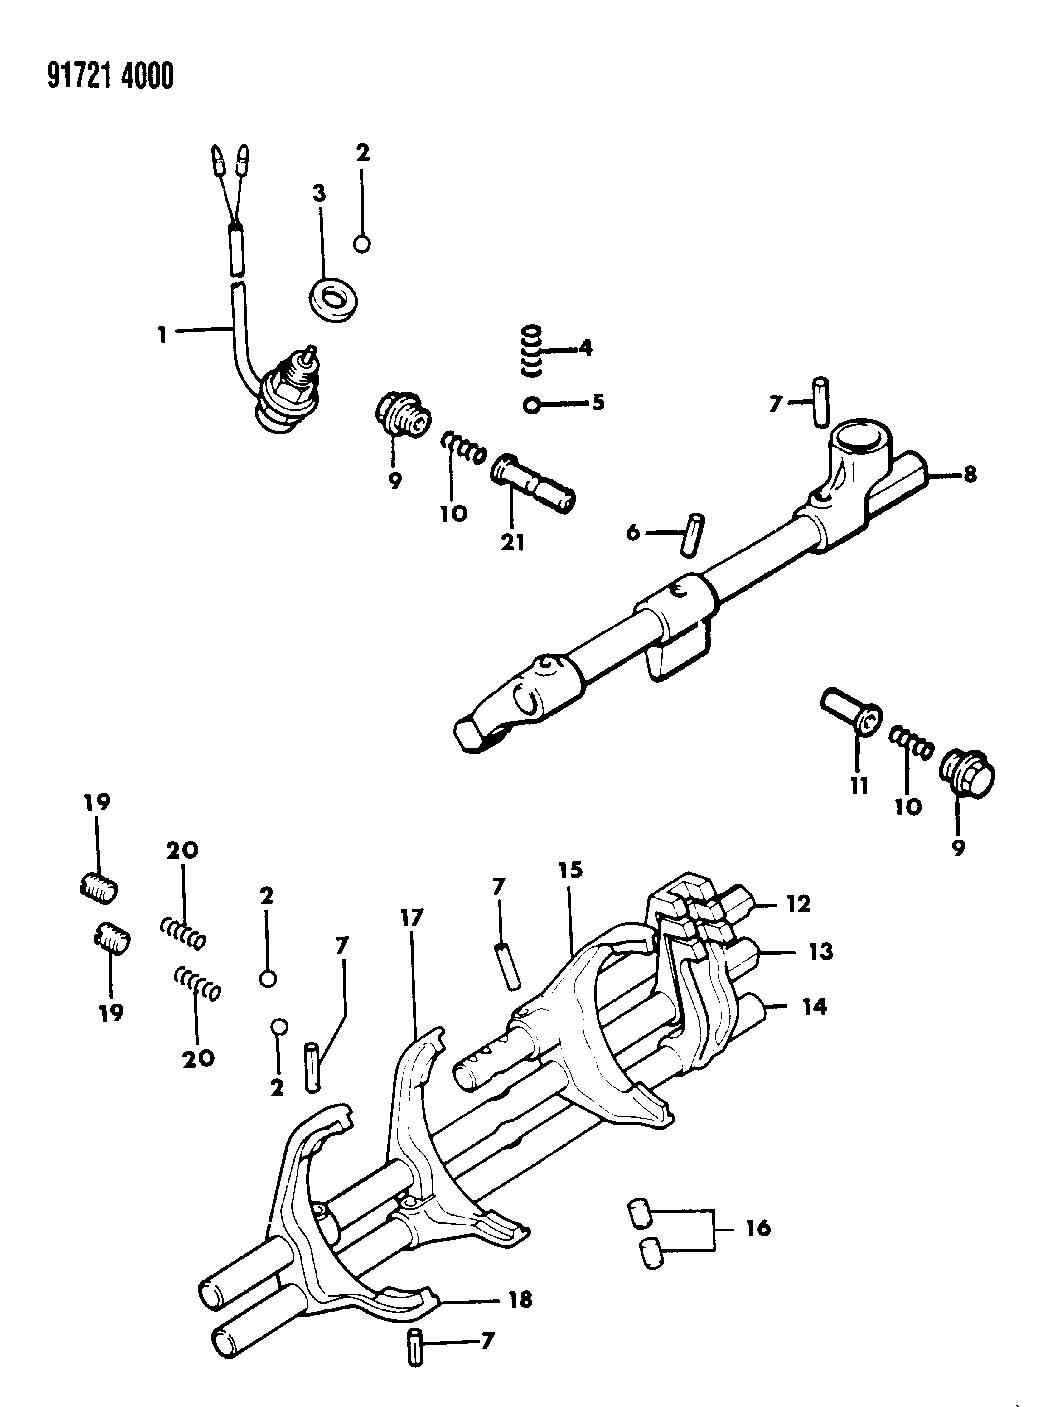 Control Shift Manual Transmission 5 Speed 27 Rwd T Engine